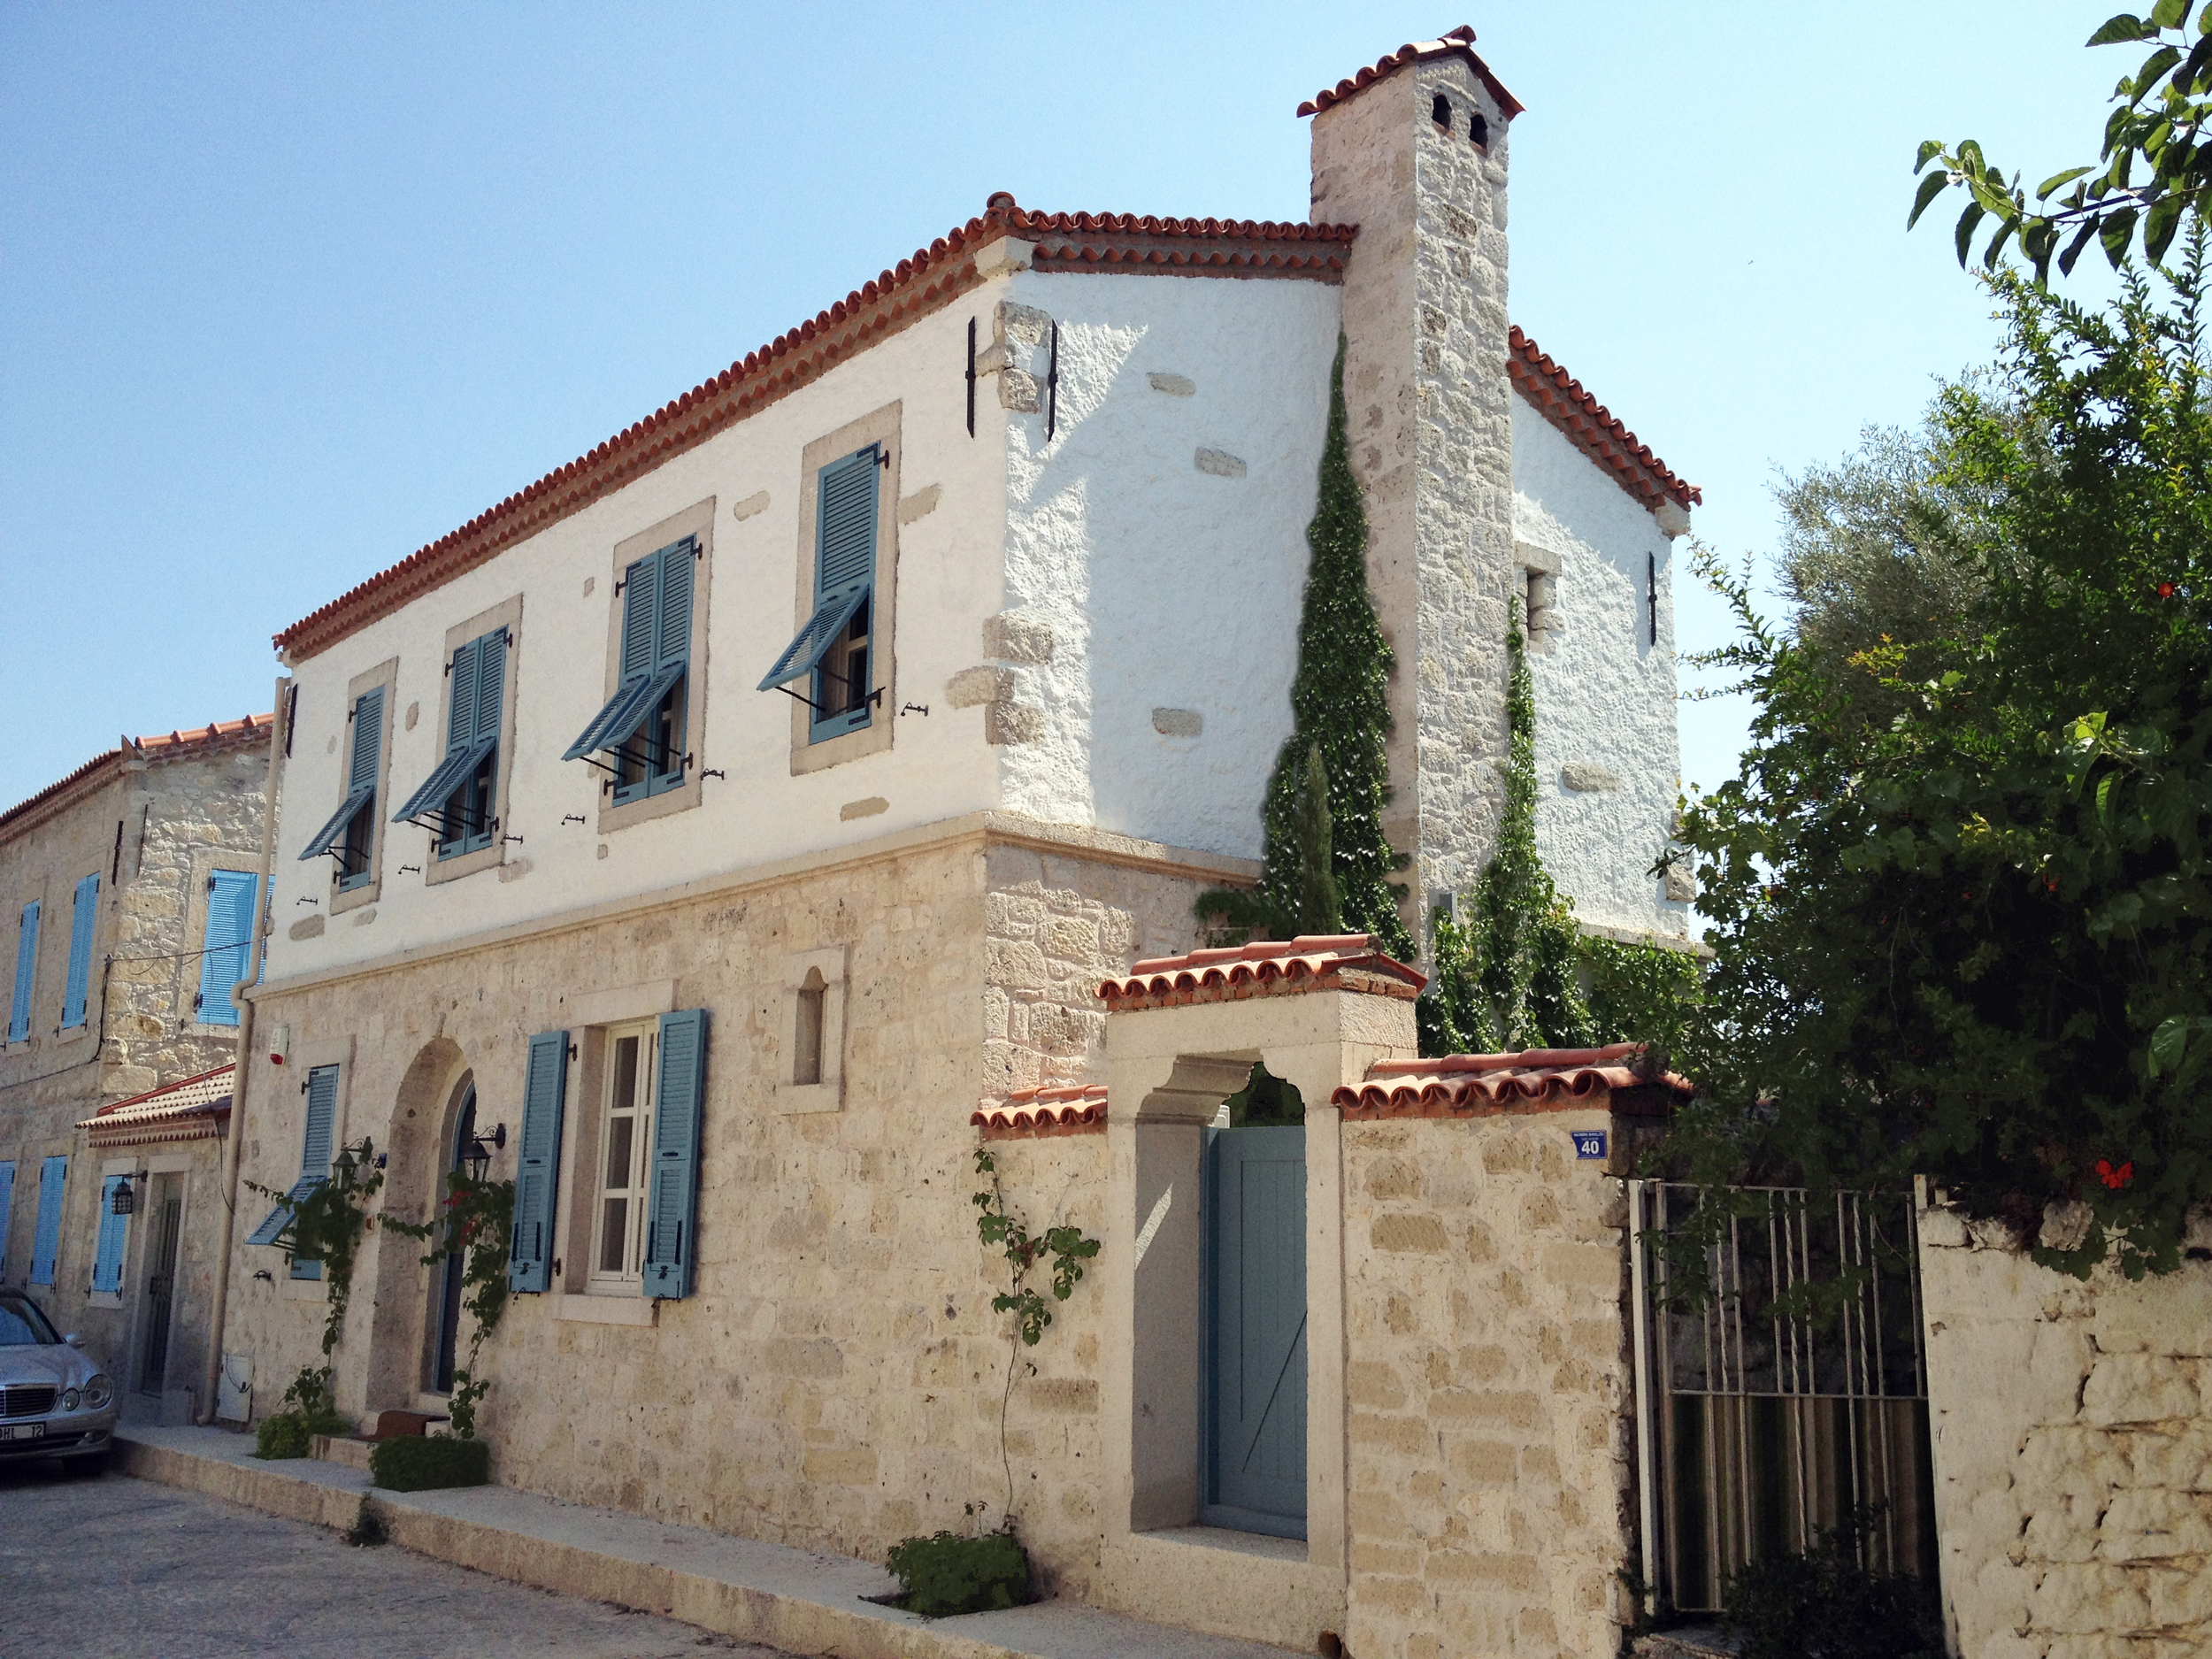 HEK HOUSE I ALACATI